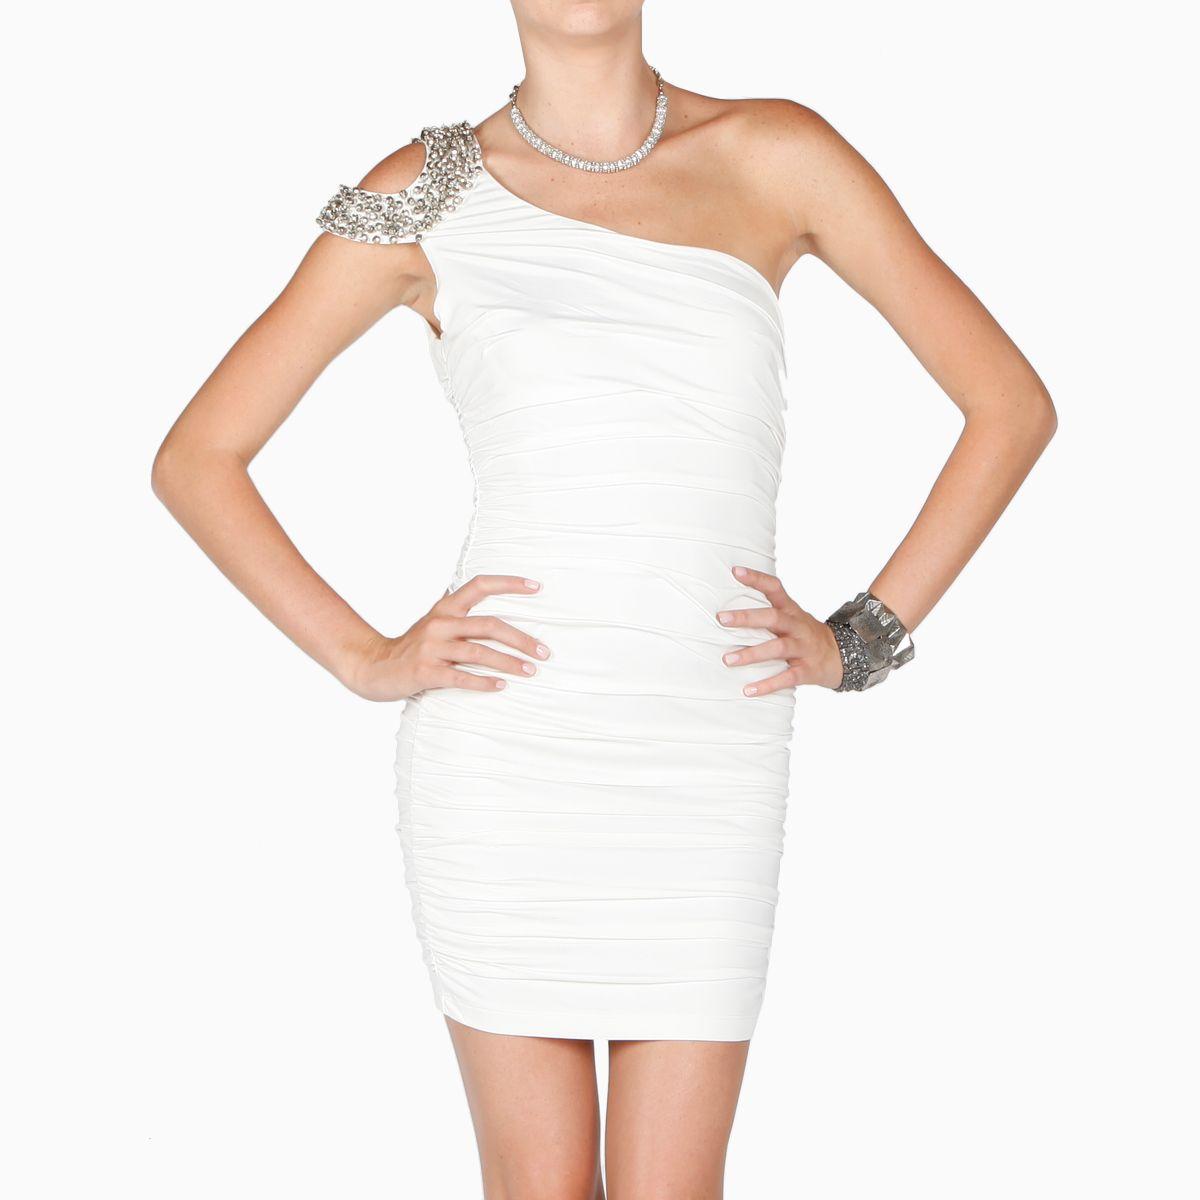 Open One Shoulder Jewel Dress | Pinterest | Jewel, Shoulder and Clothes